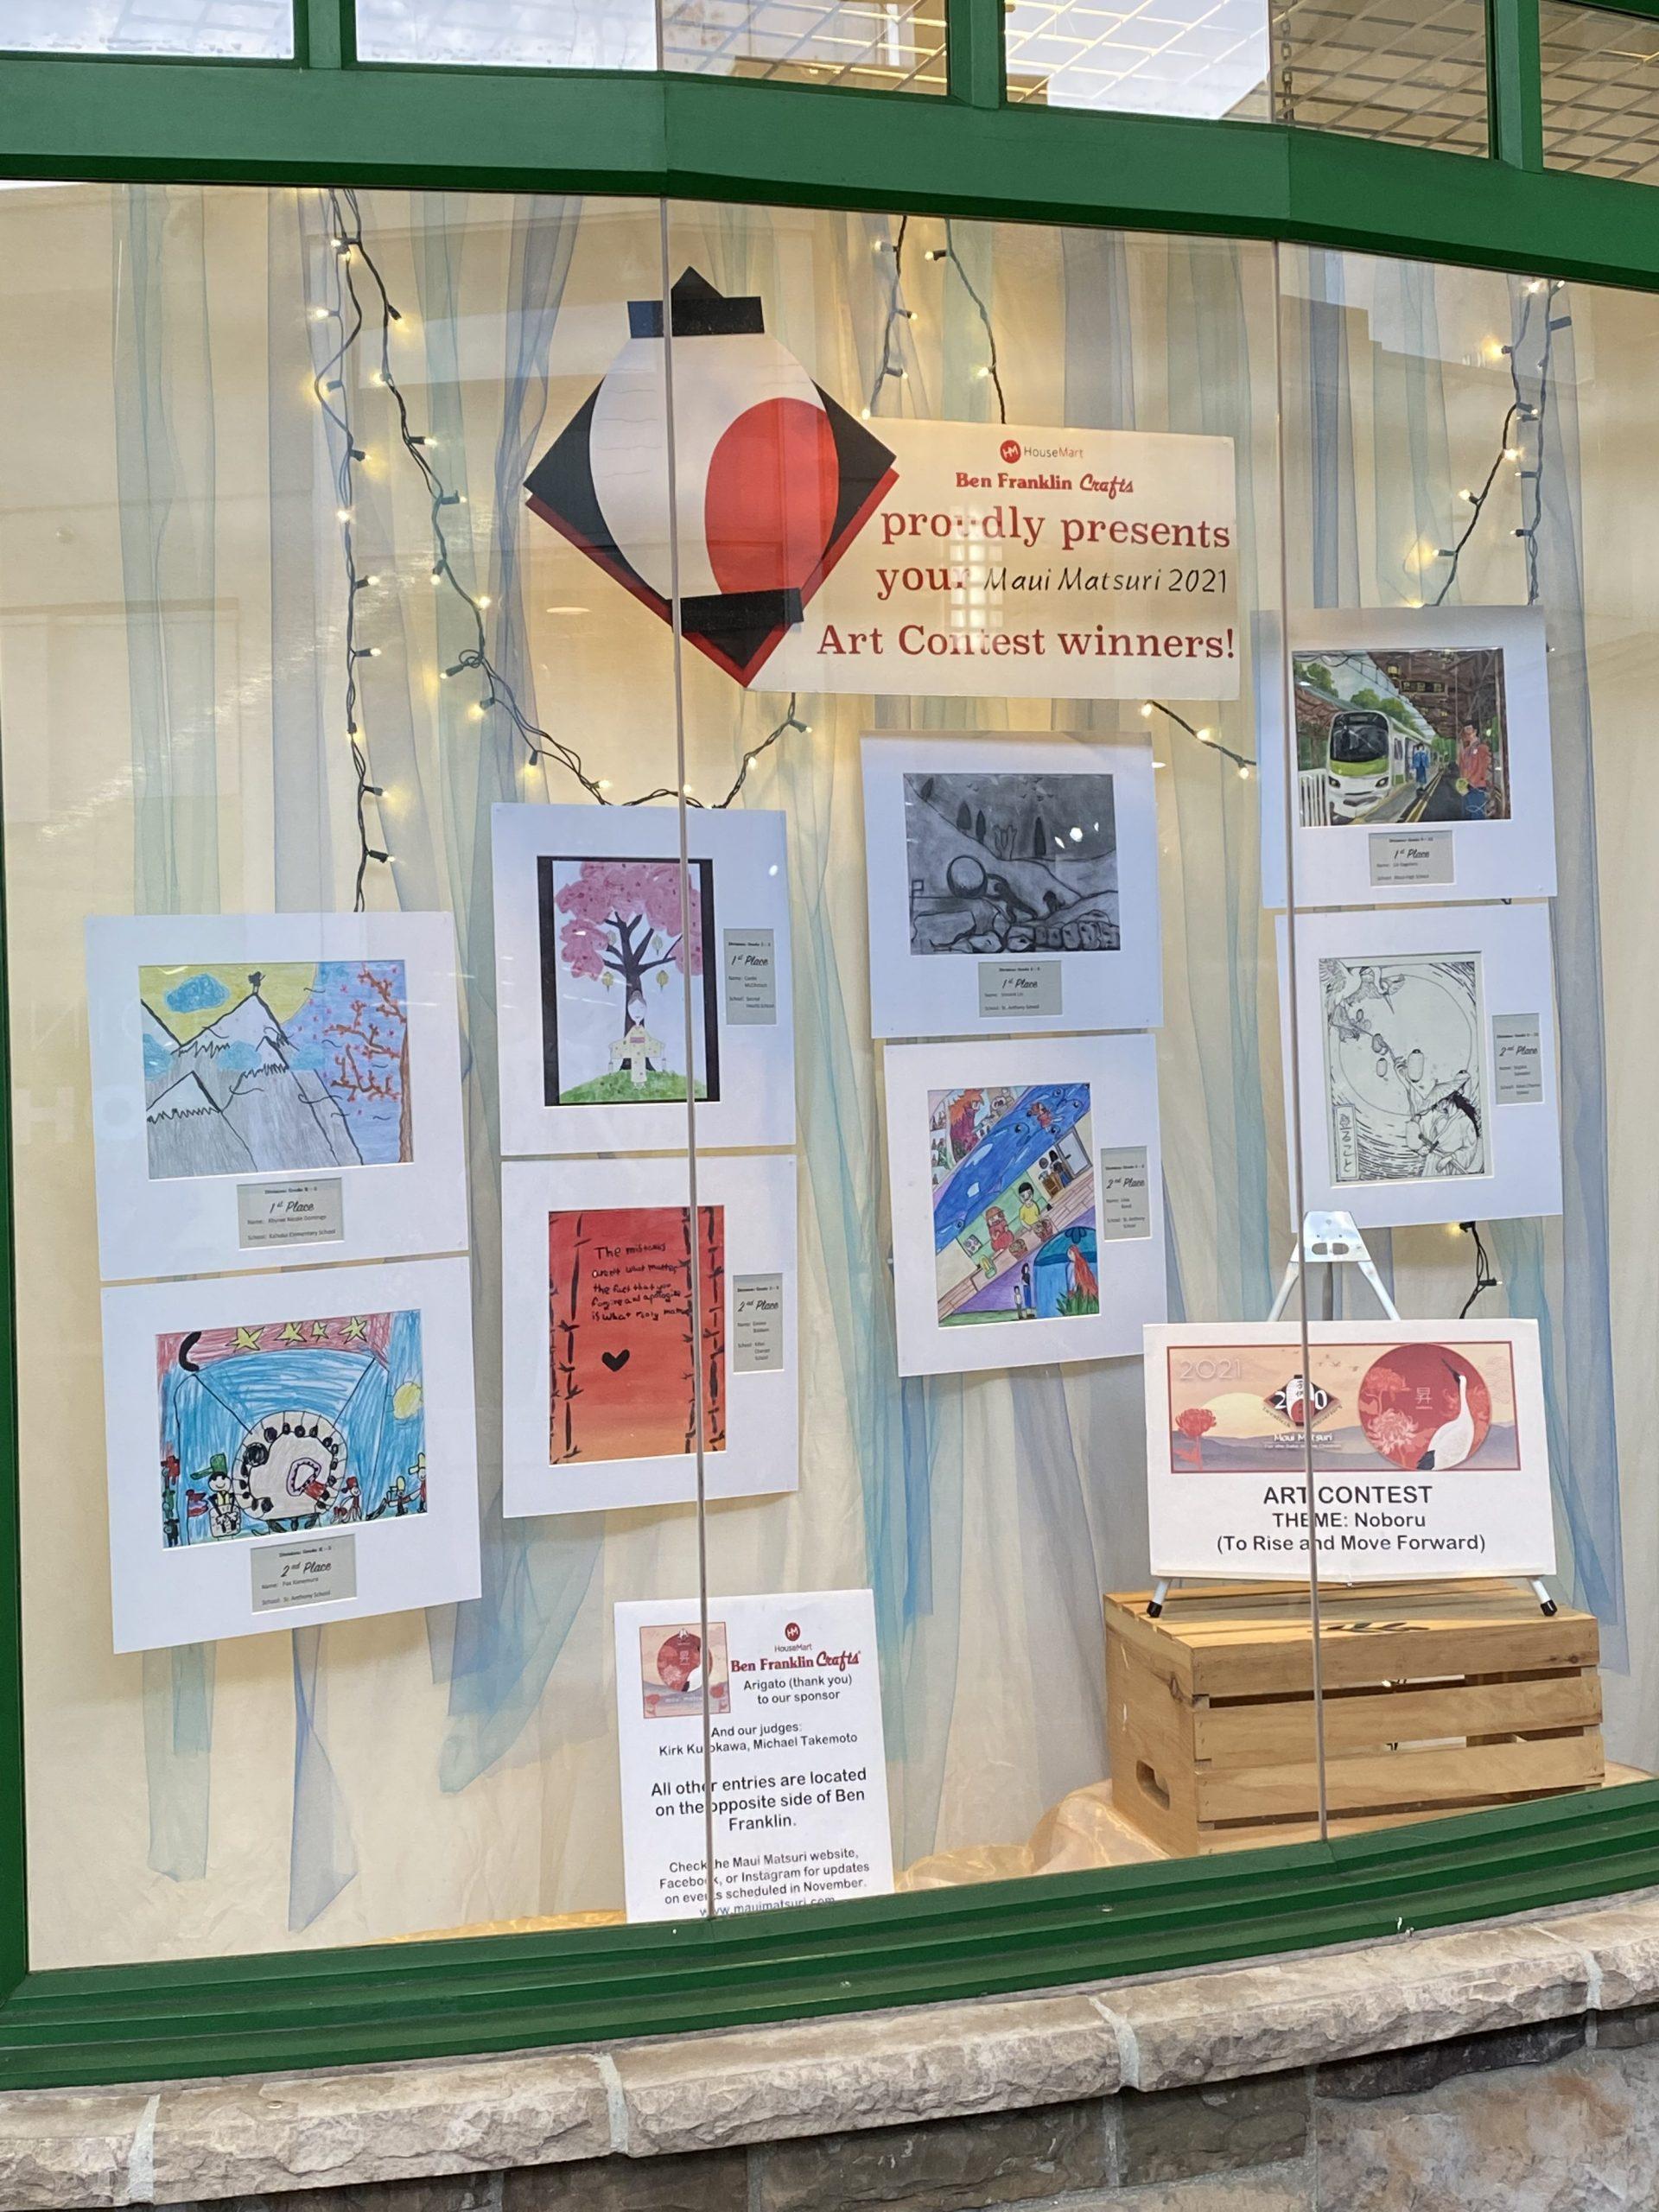 Art of Maui Matsuri Contest Winners on Display at Queen K Center